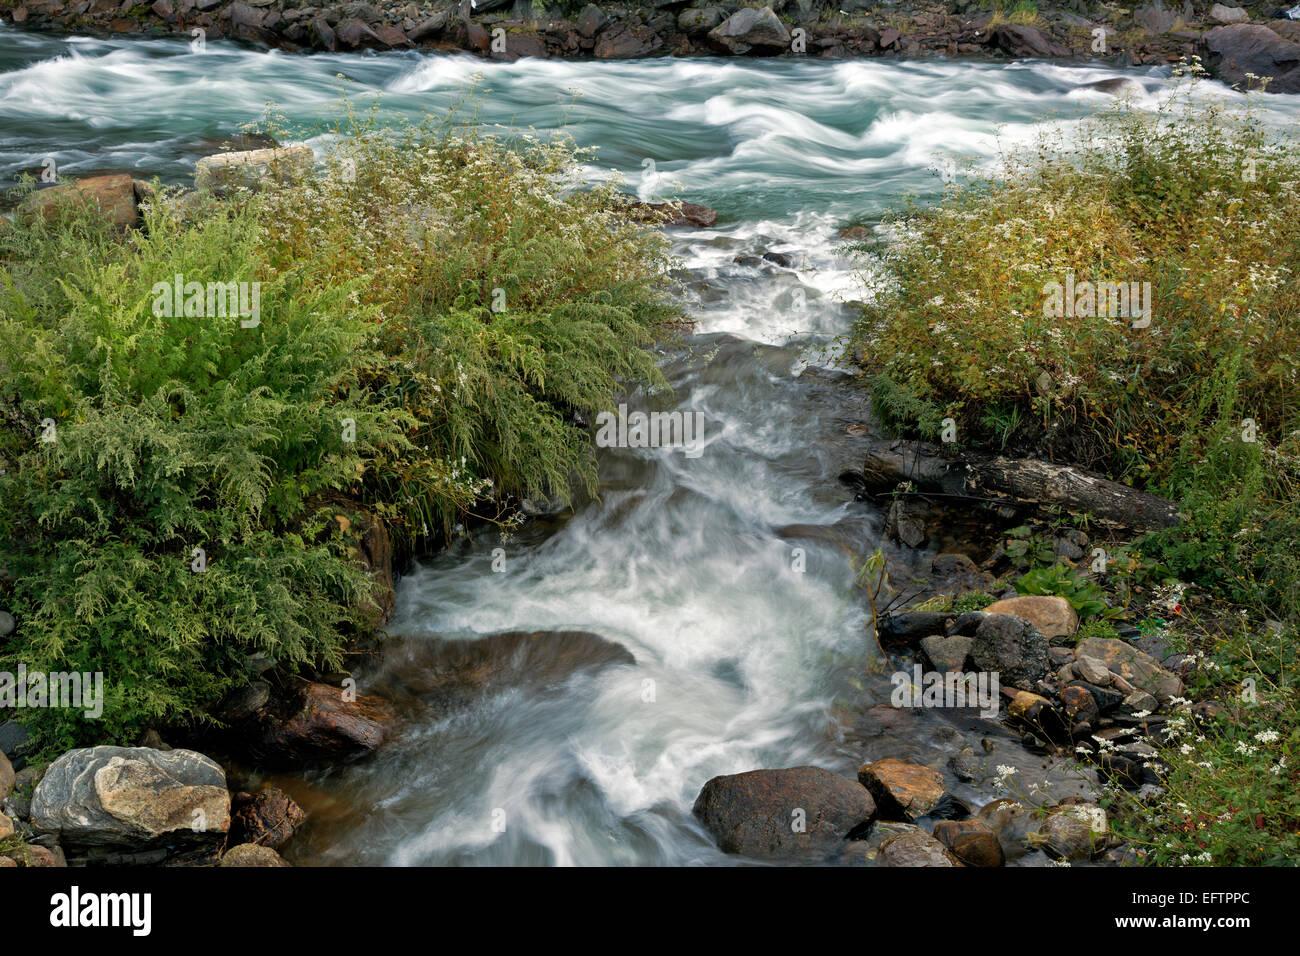 BU00084-00...BHUTAN - Side steam joins the Wang Chhu (river) in the capital city of Thimphu. - Stock Image